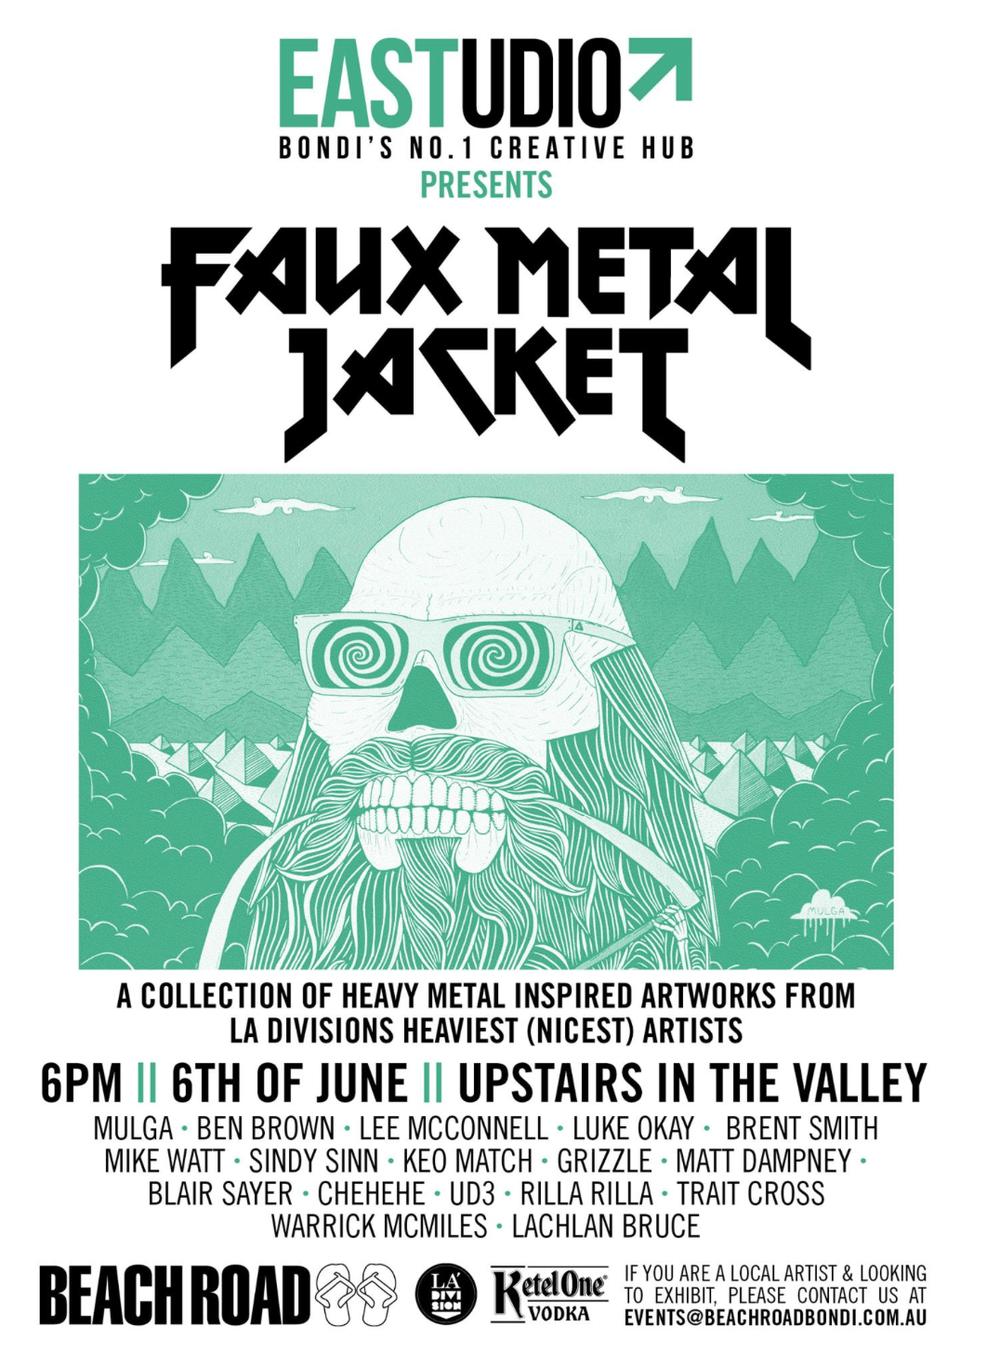 Faux-metal-jacket-puns-art-album-cover-music-heavy-la-division-sam-shennan-ud3-mulga-ben-brown-mike-watt-poster-art-design-sydney-illustrators.png